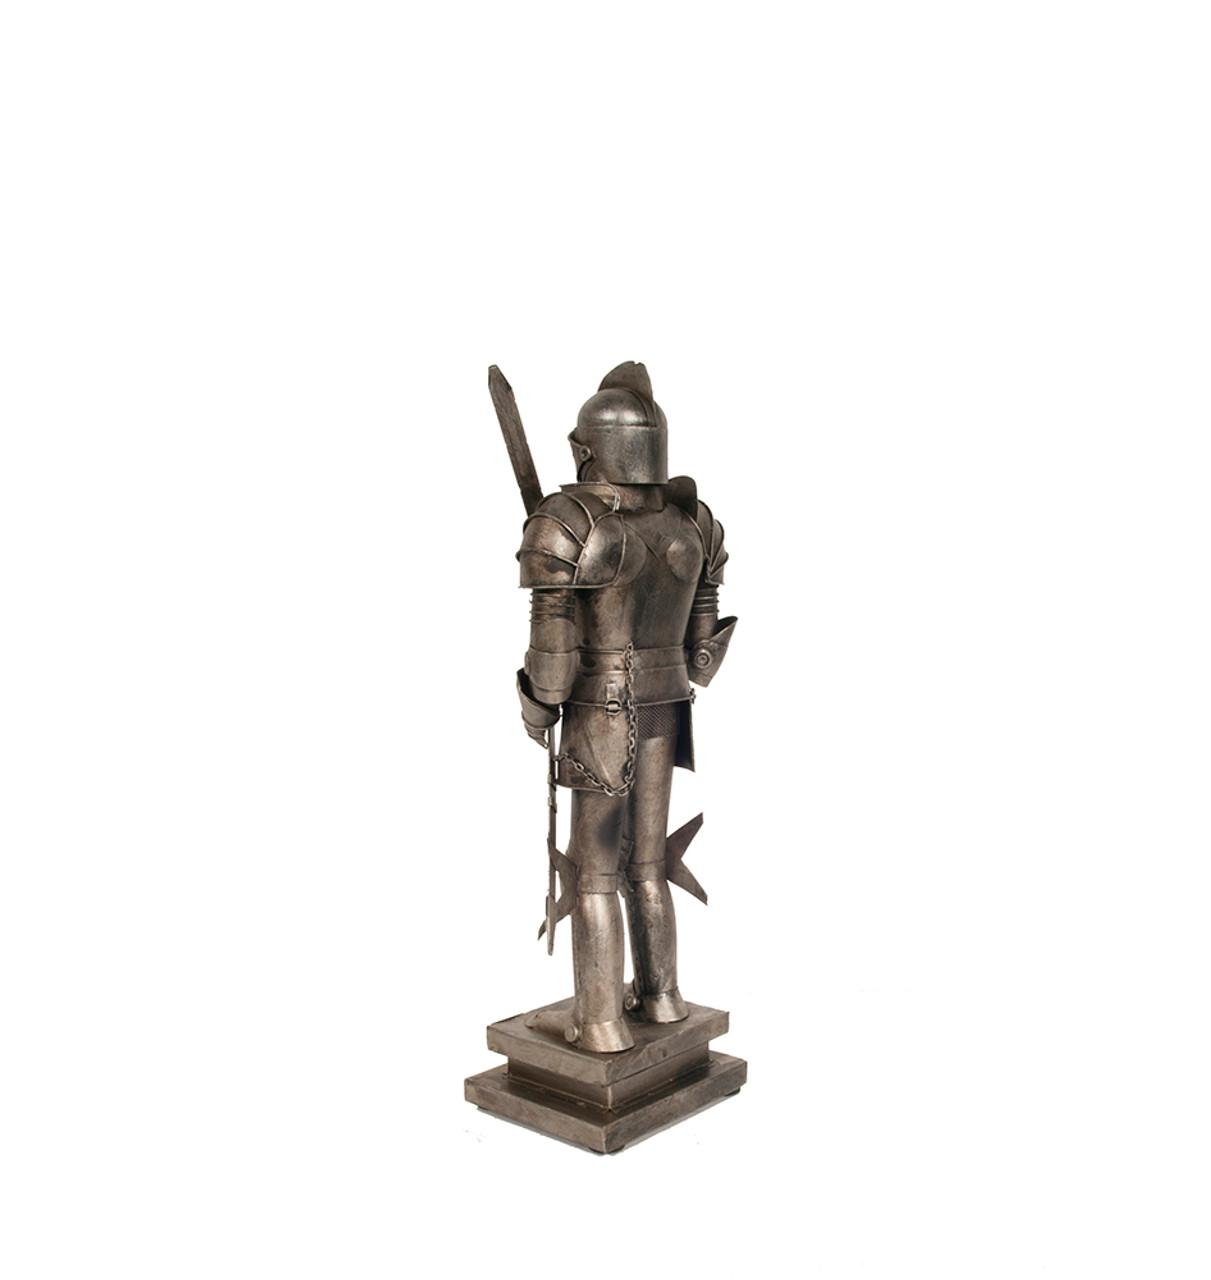 Medieval Knight Suit Of Armor Statue Sword Metal Model Figurine